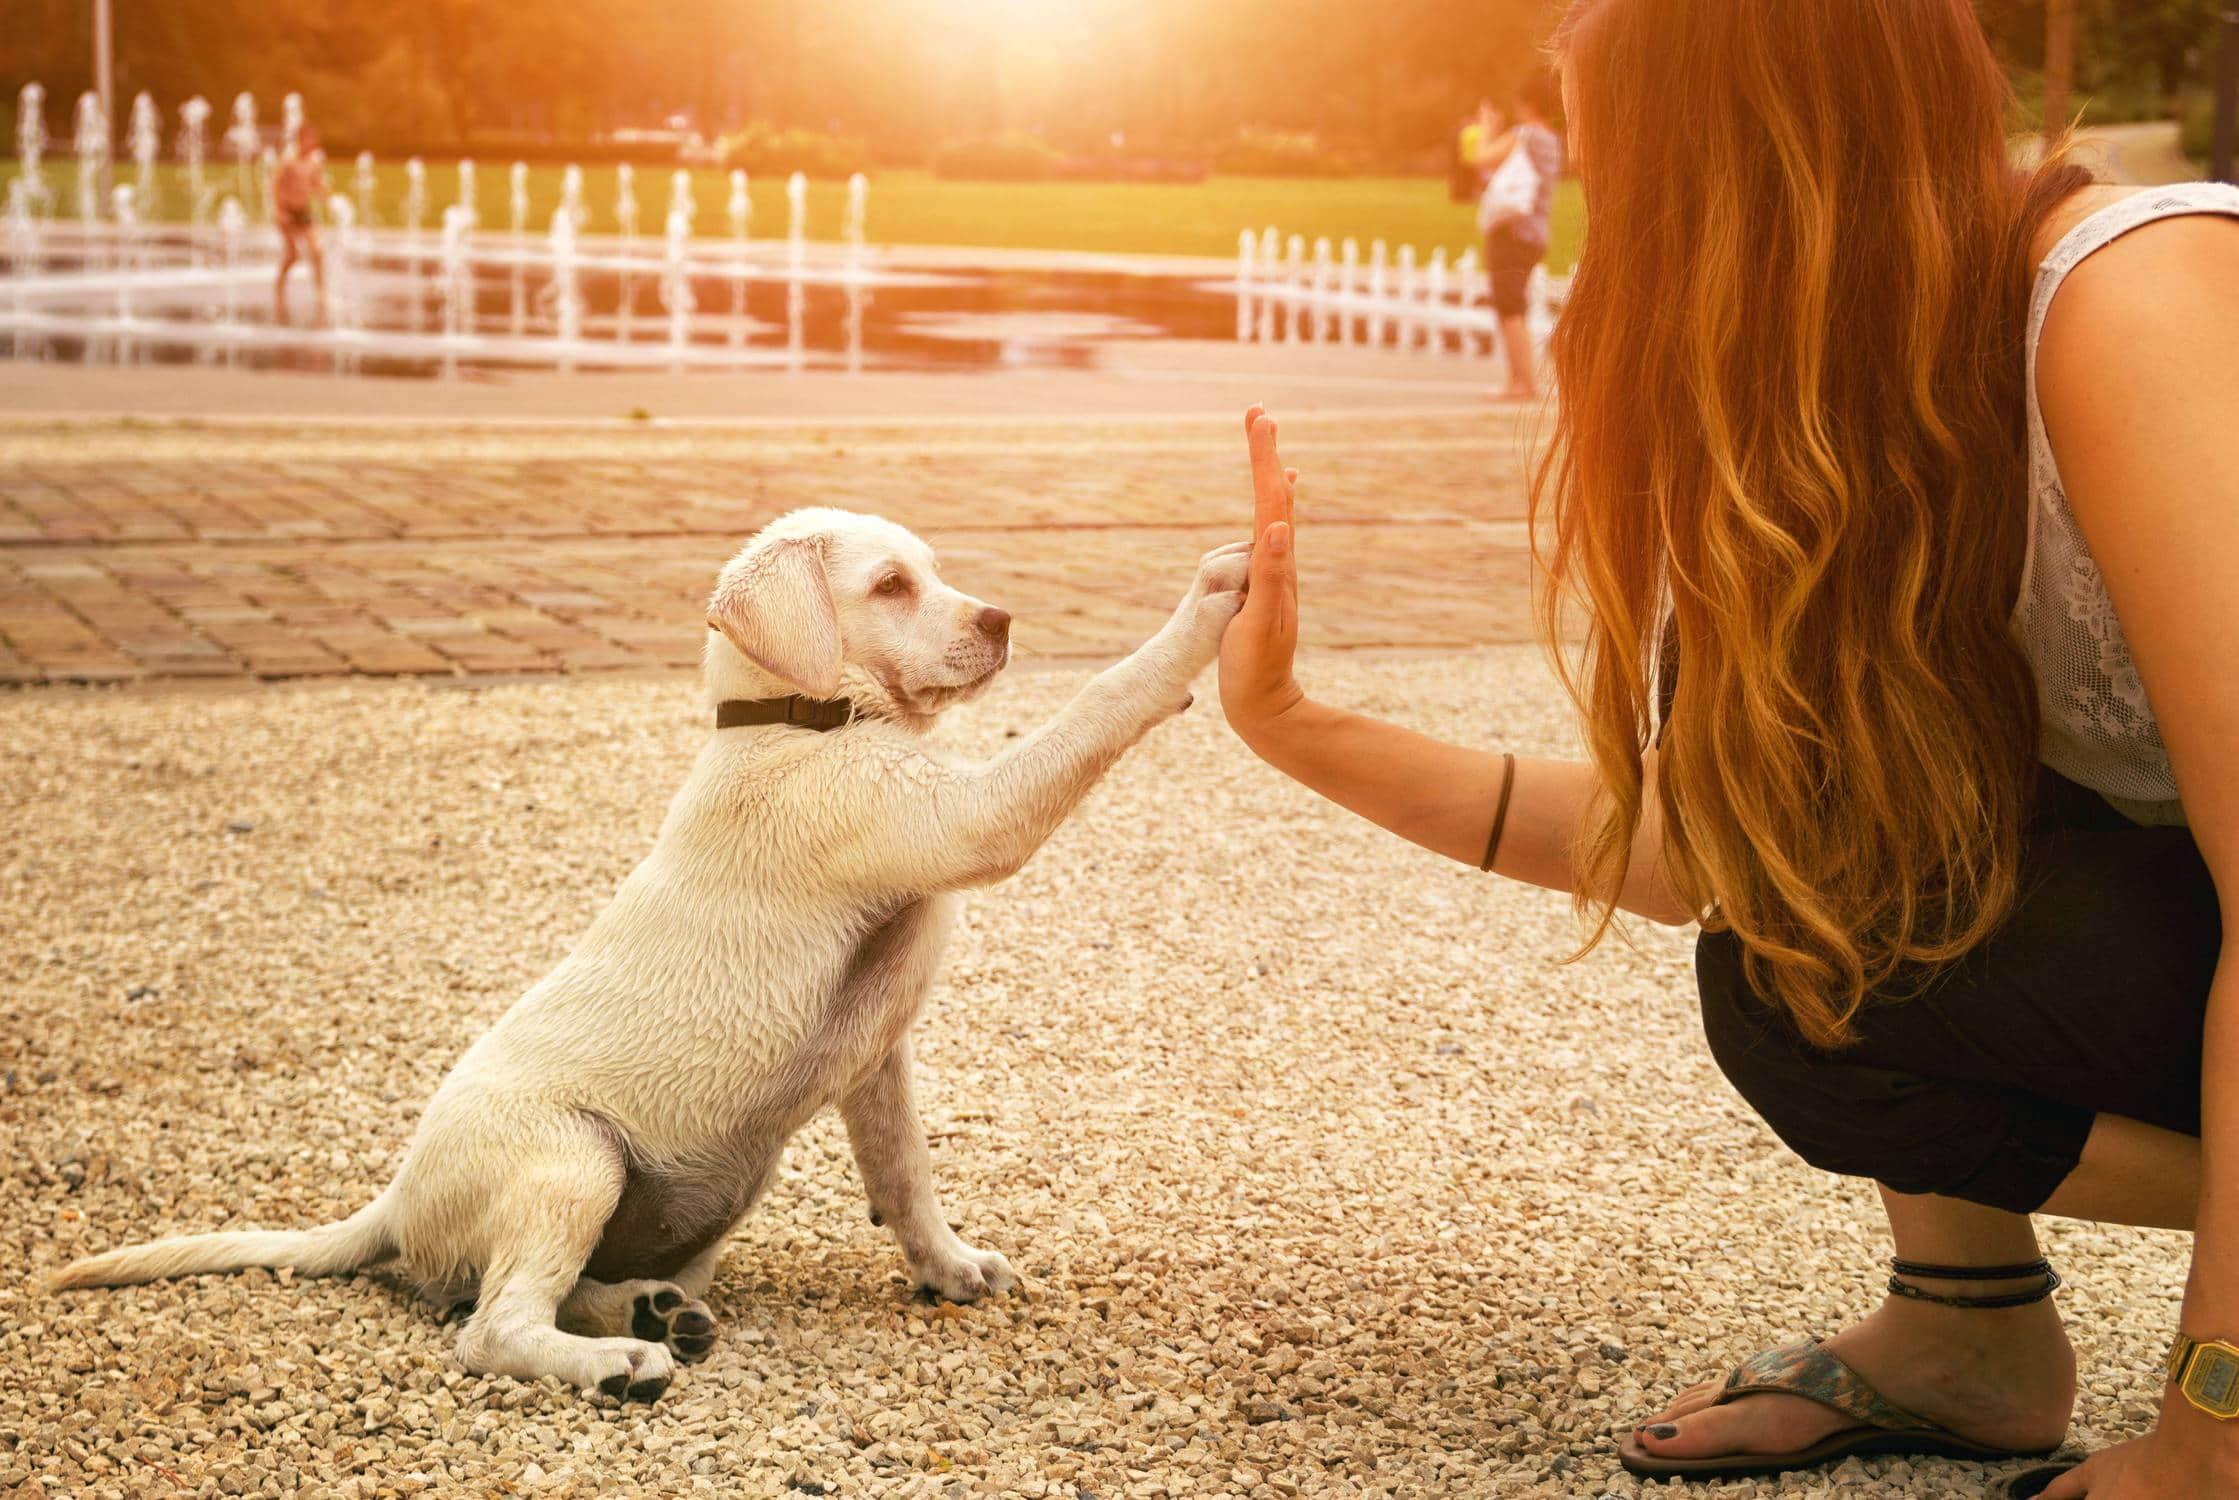 Dating sites for dog lovers uk in Brisbane